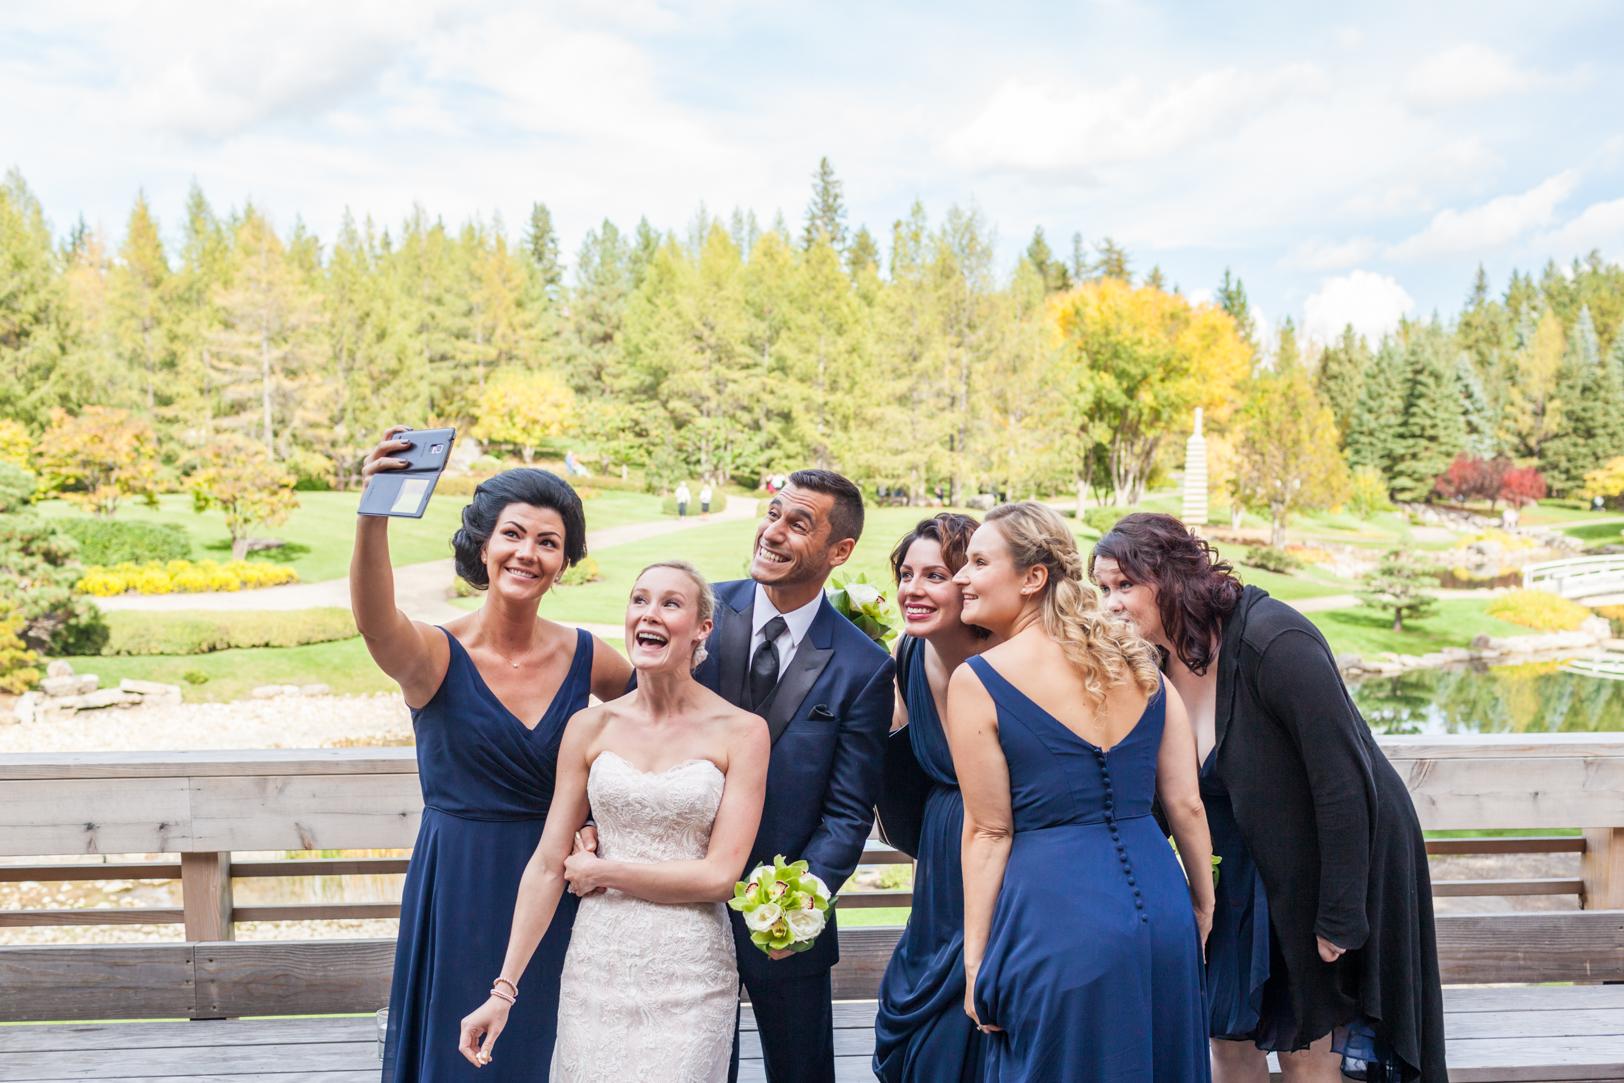 Devonian Botanic Gardens Wedding - fun wedding party photos